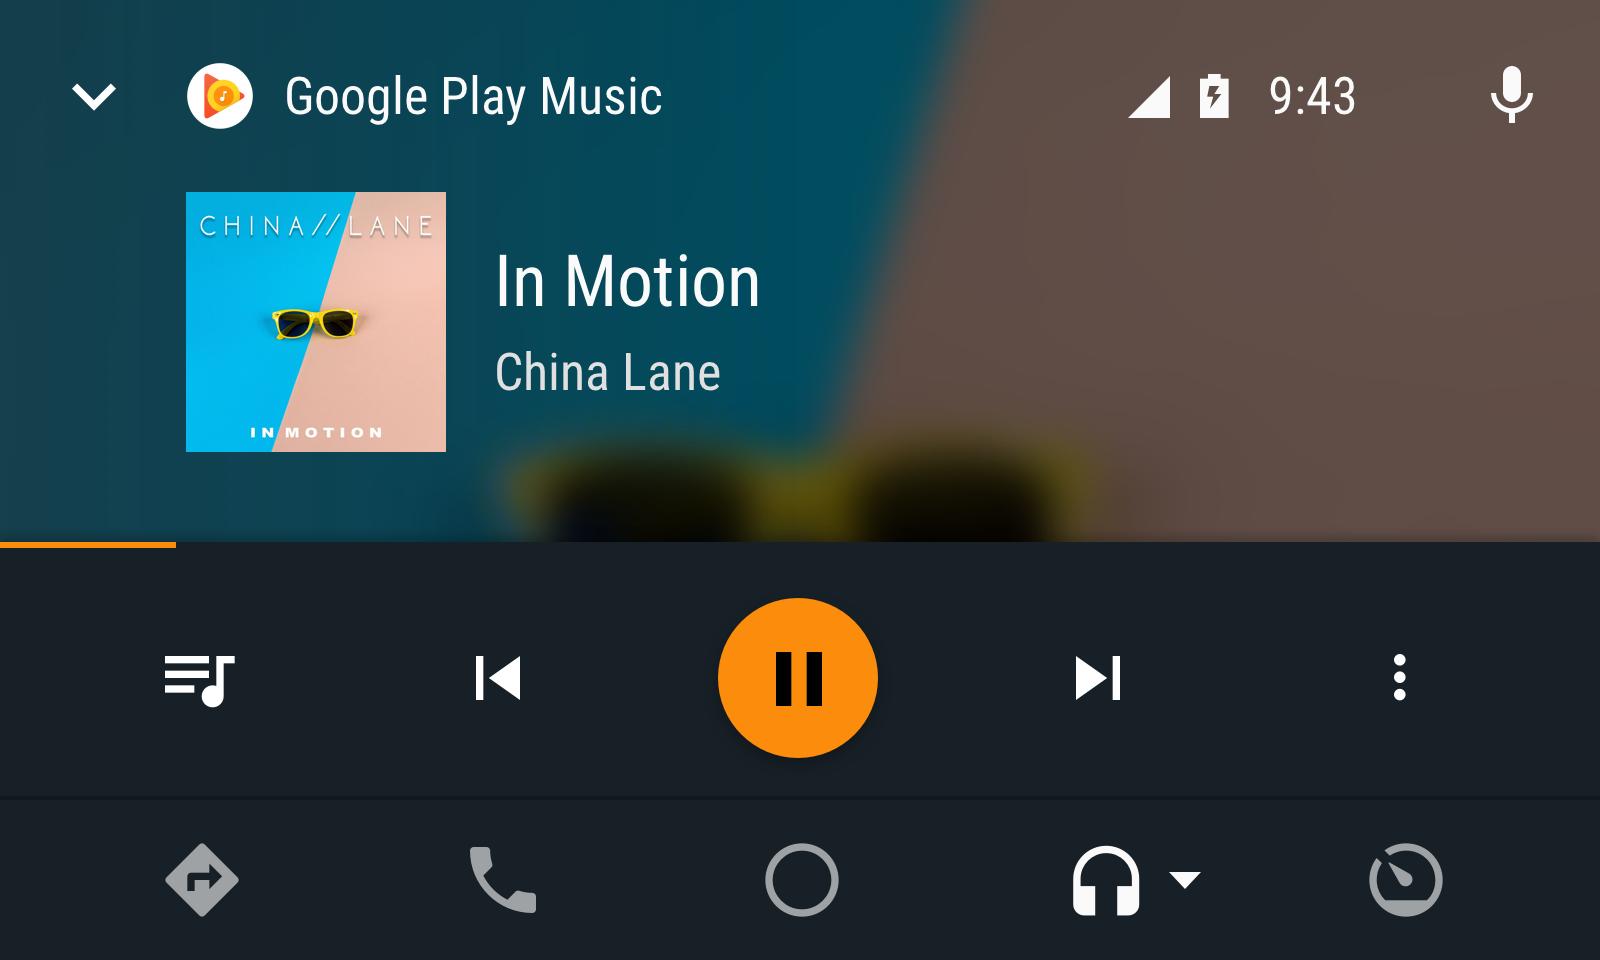 Customized audio app UI